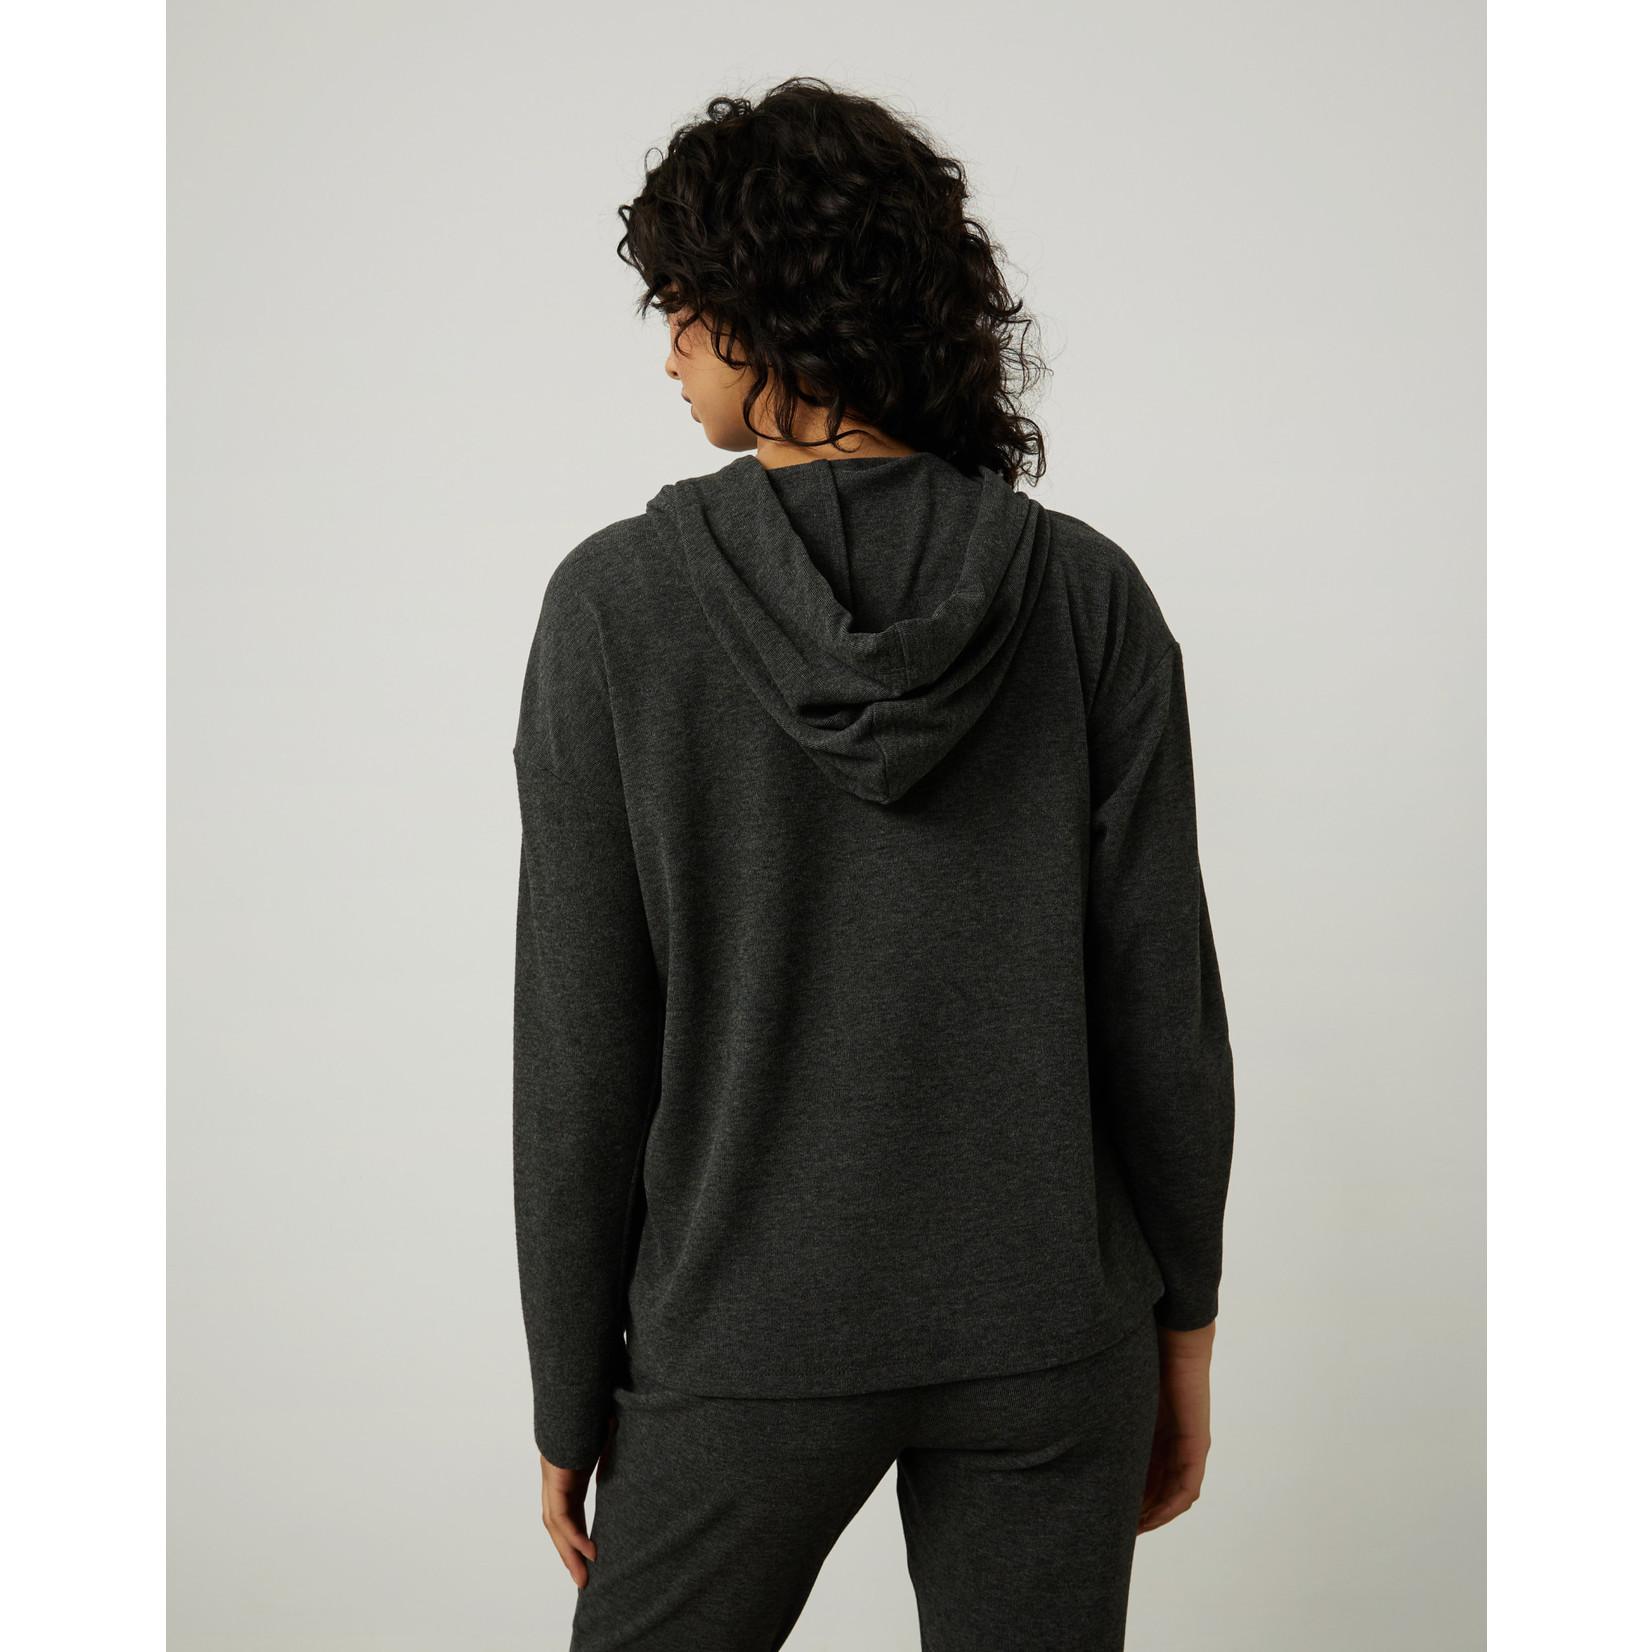 Joseph Ribkoff Dolman Sleeve Hoodie Style 214100